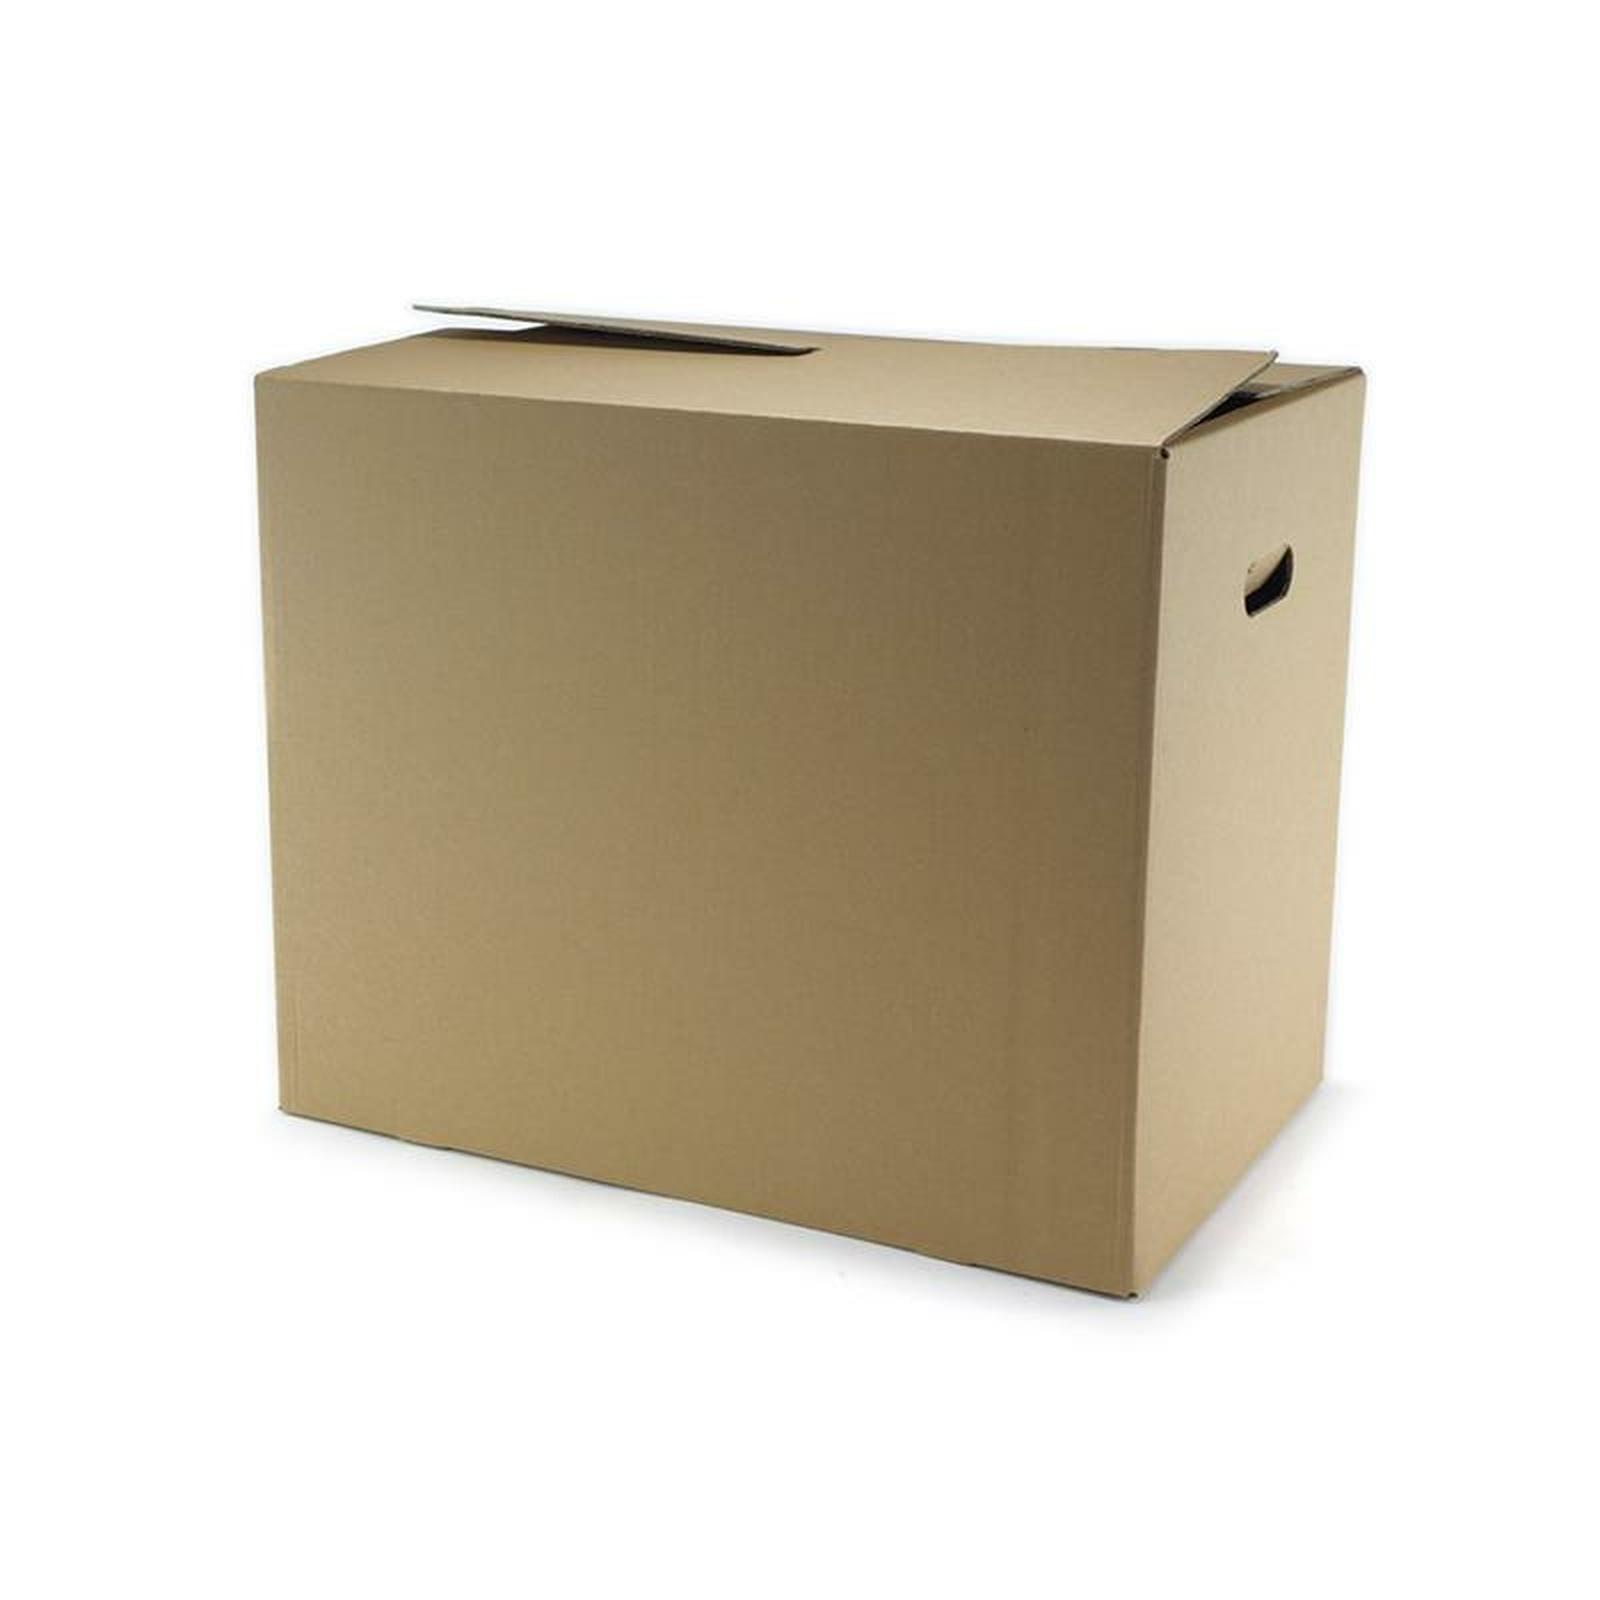 umzugskarton 550x350x450 mm g nstig kaufen 1 48. Black Bedroom Furniture Sets. Home Design Ideas